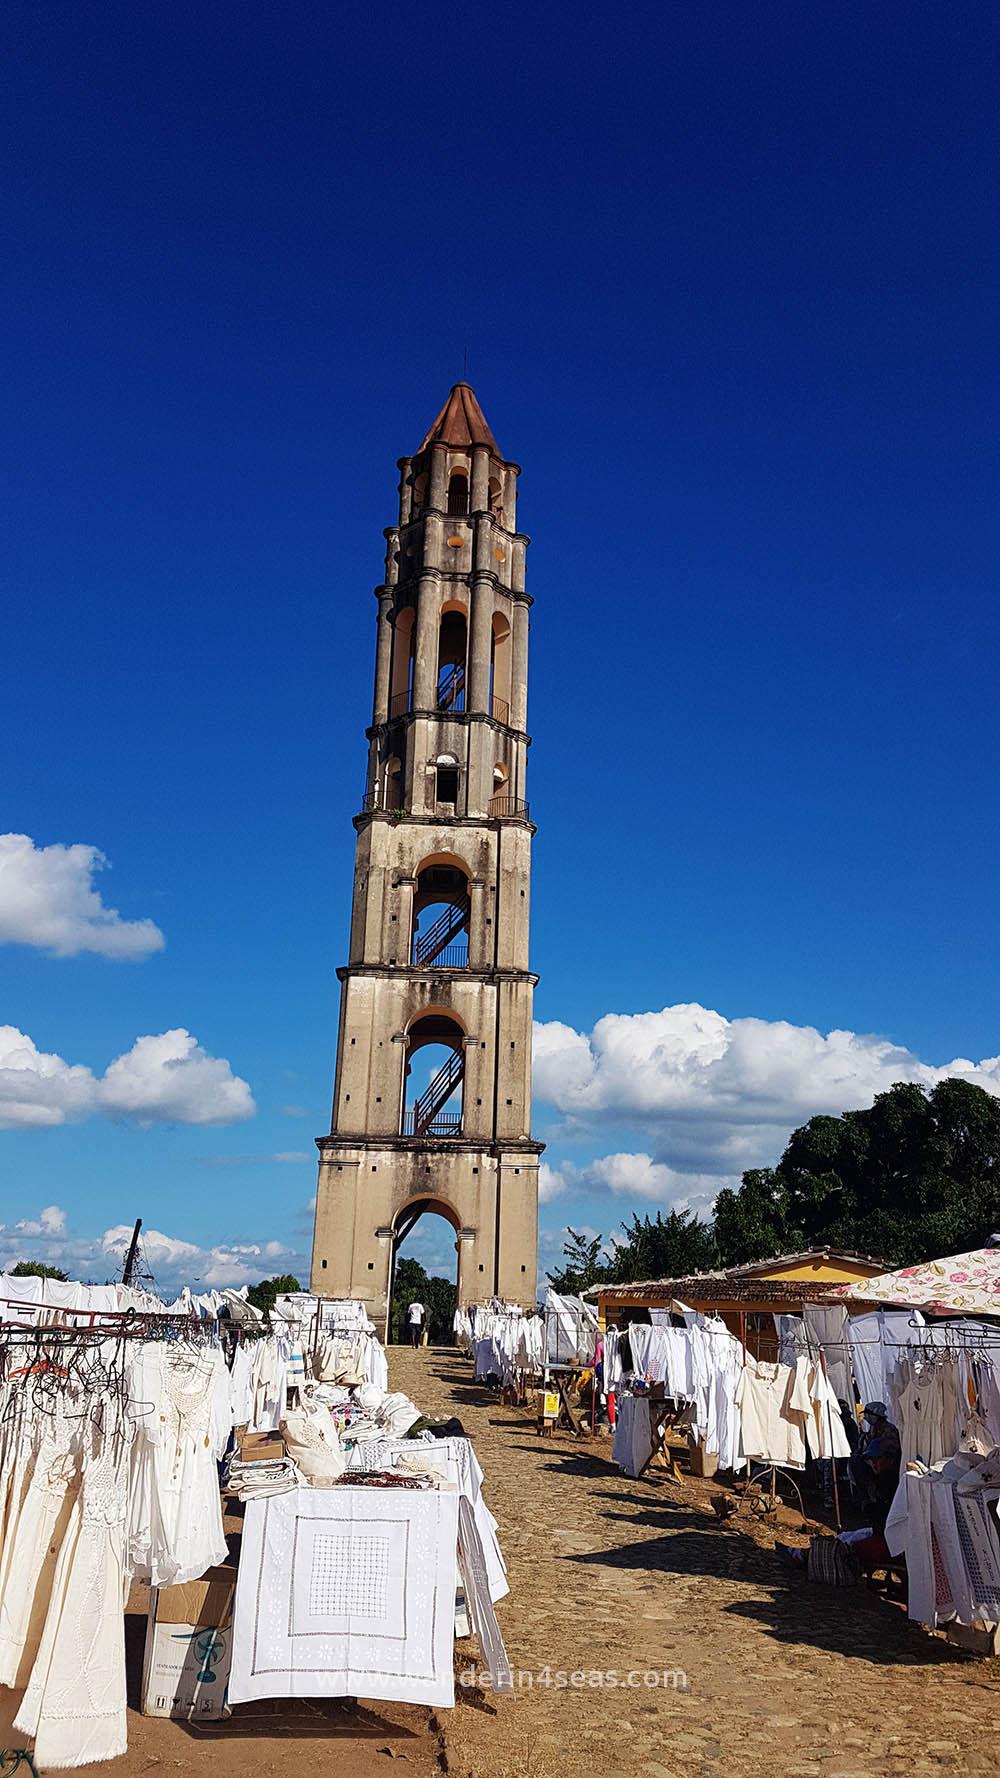 Manaca Iznaga Tower